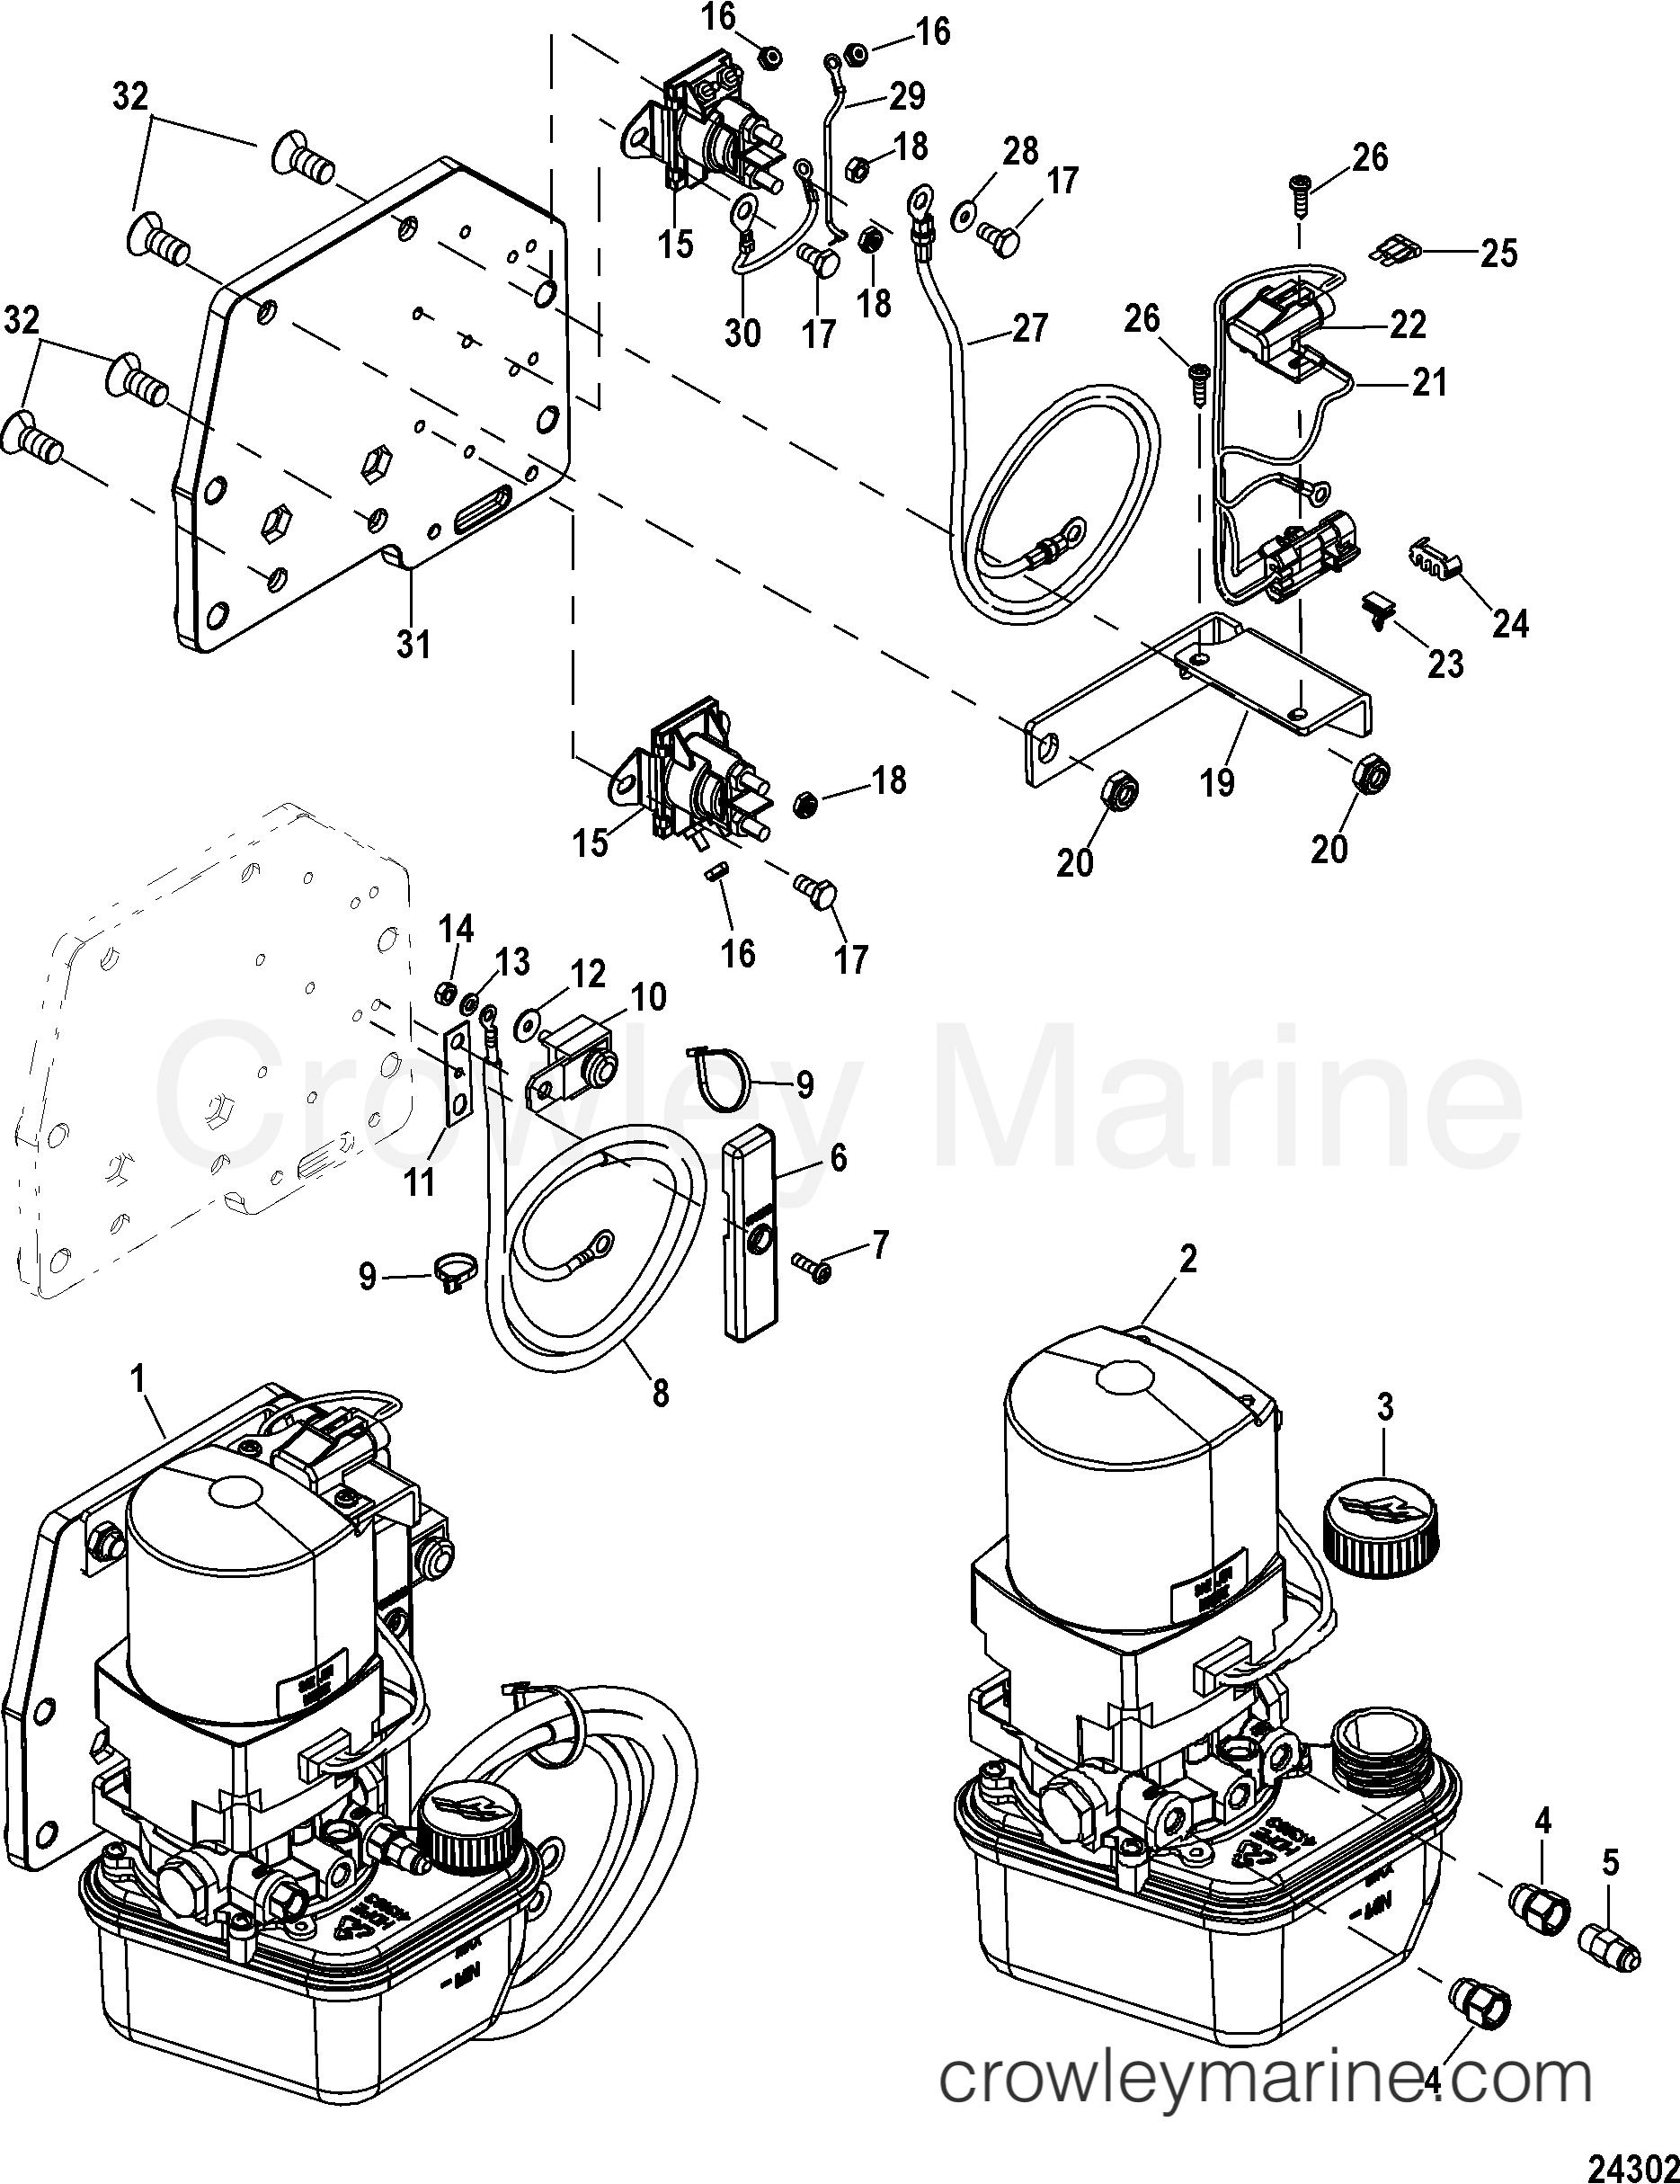 trim pump assembly 843017t03